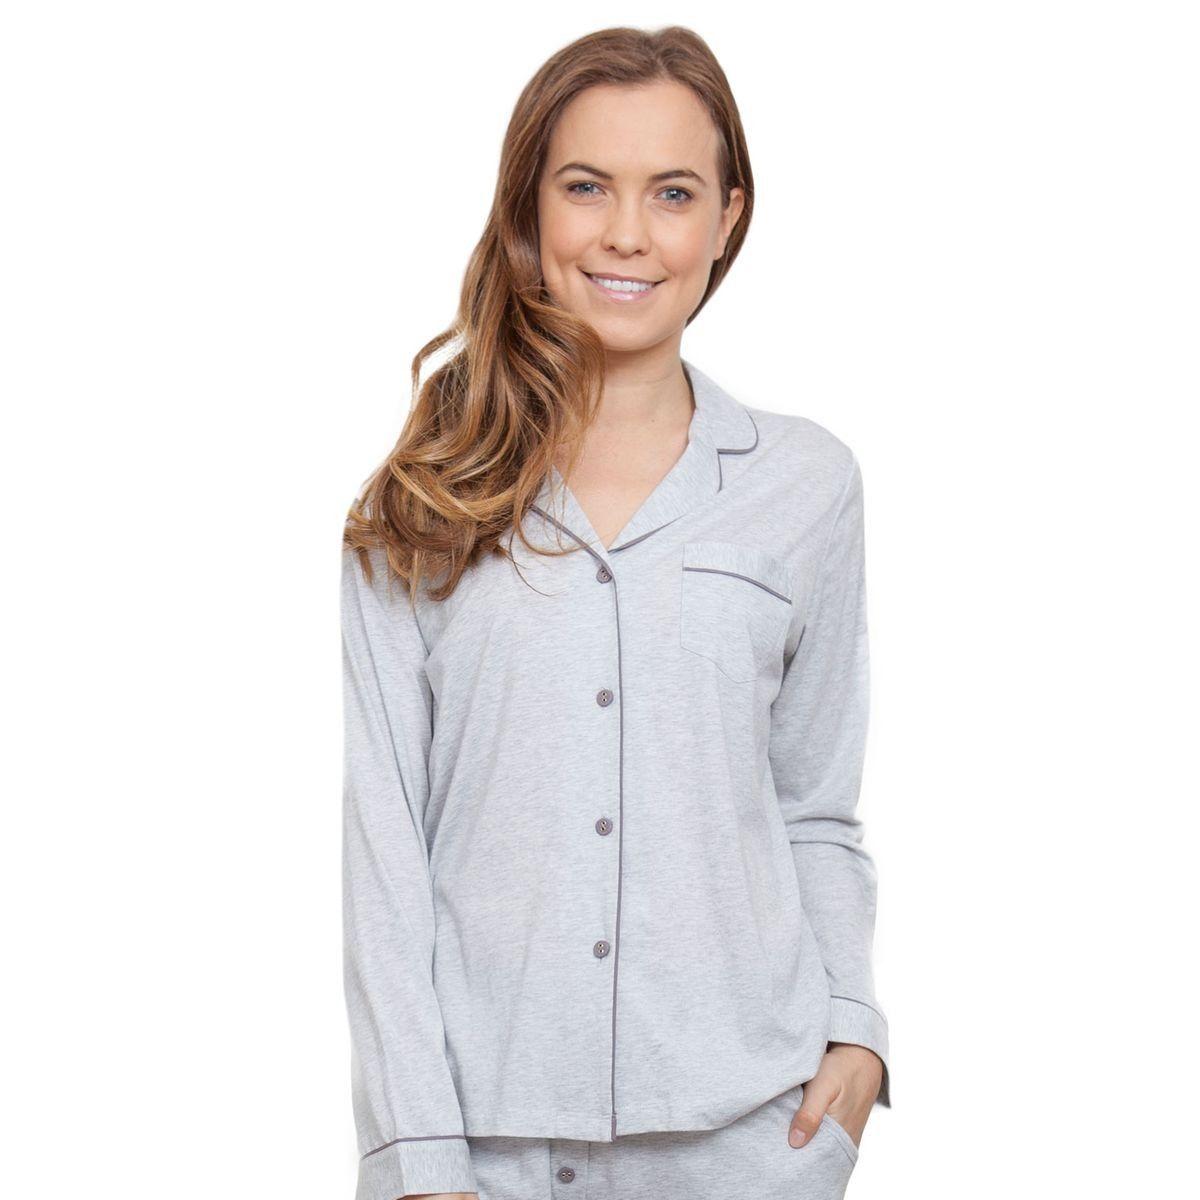 Haut de Pyjama en Modal ERICA | Pyjama, Grande